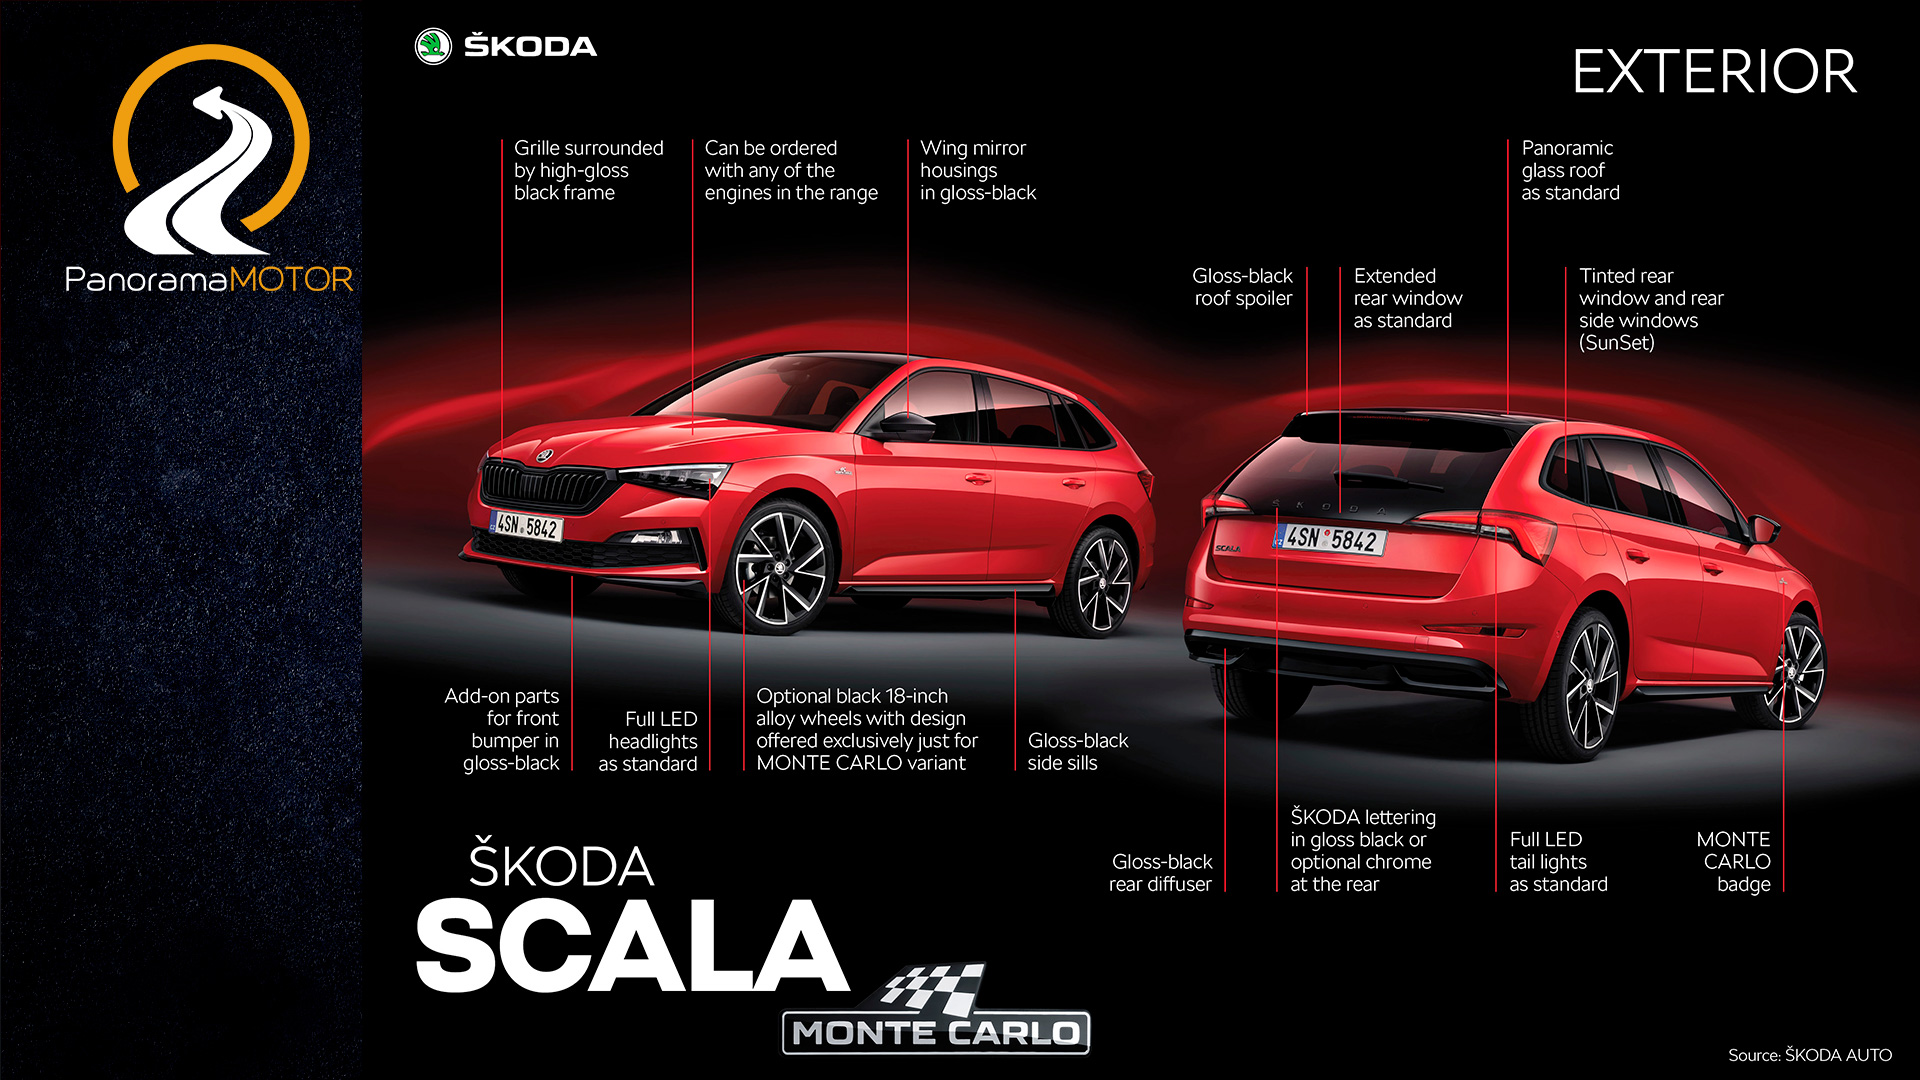 Skoda Scala Monte Carlo 2020